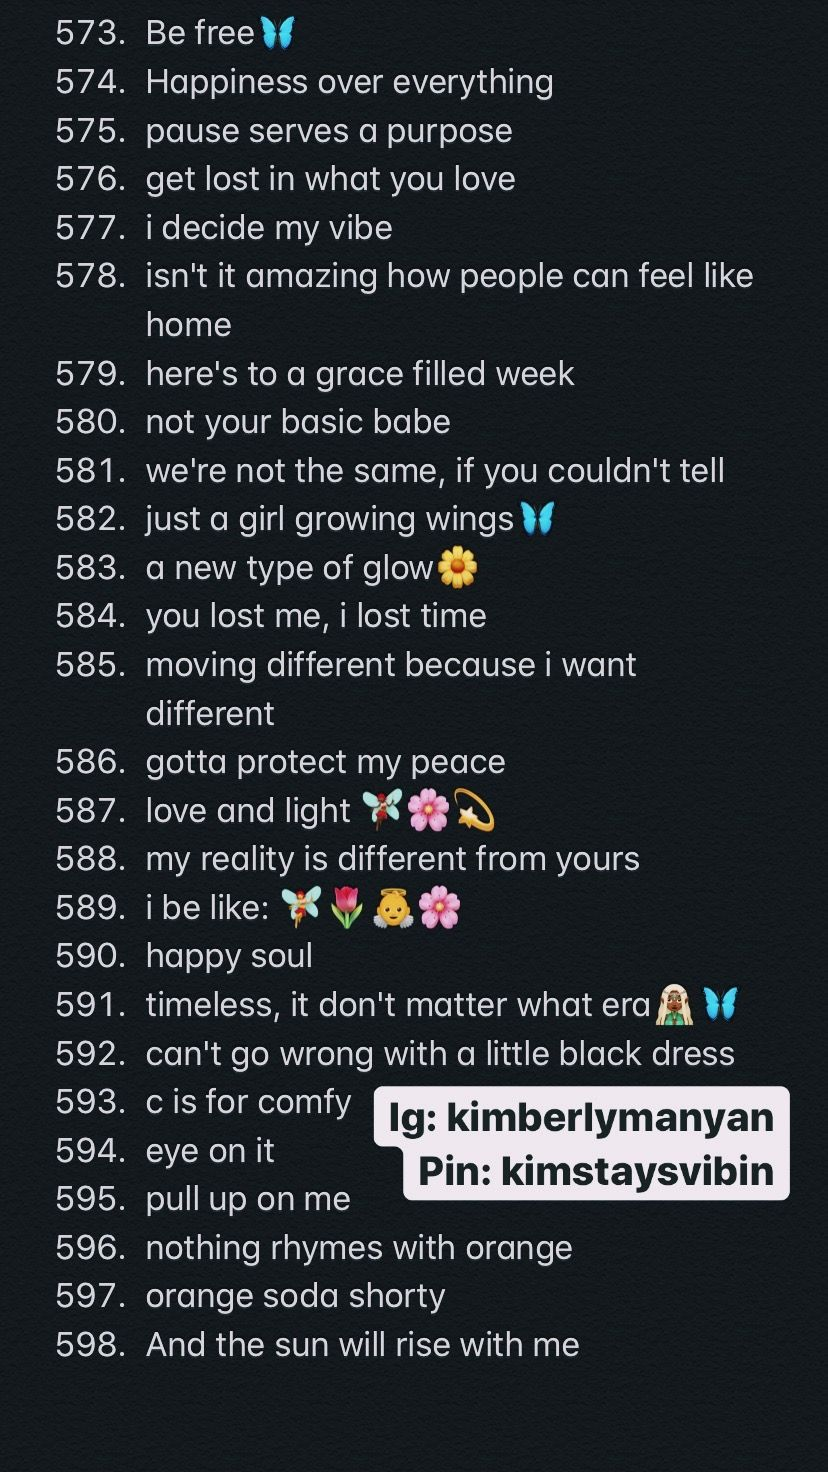 Insta Captions In 2020 Funny Instagram Captions Witty Instagram Captions Instagram Quotes